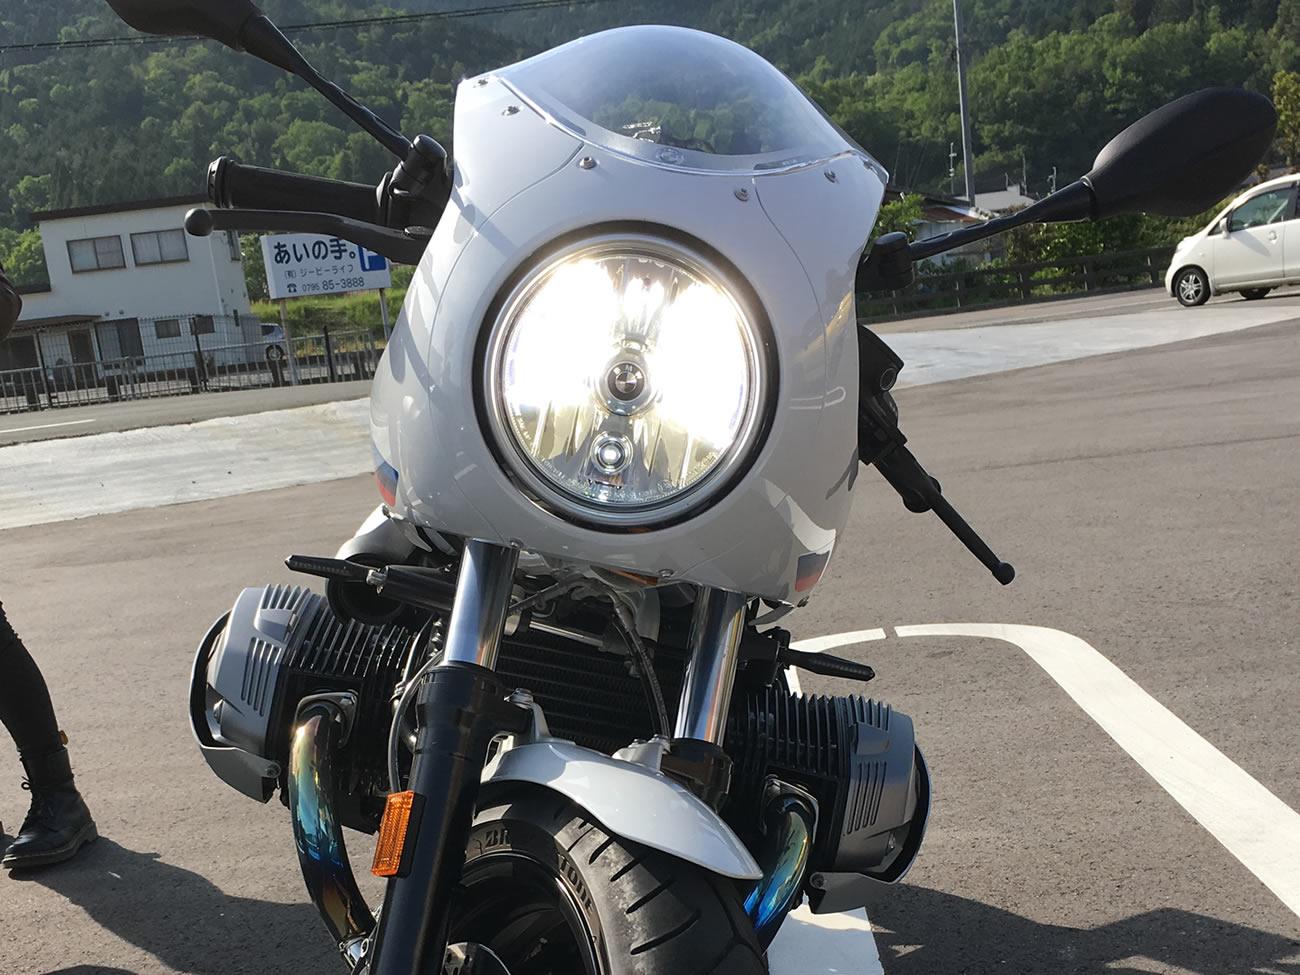 R nineT racer(BMW)のヘッドライトをHID化